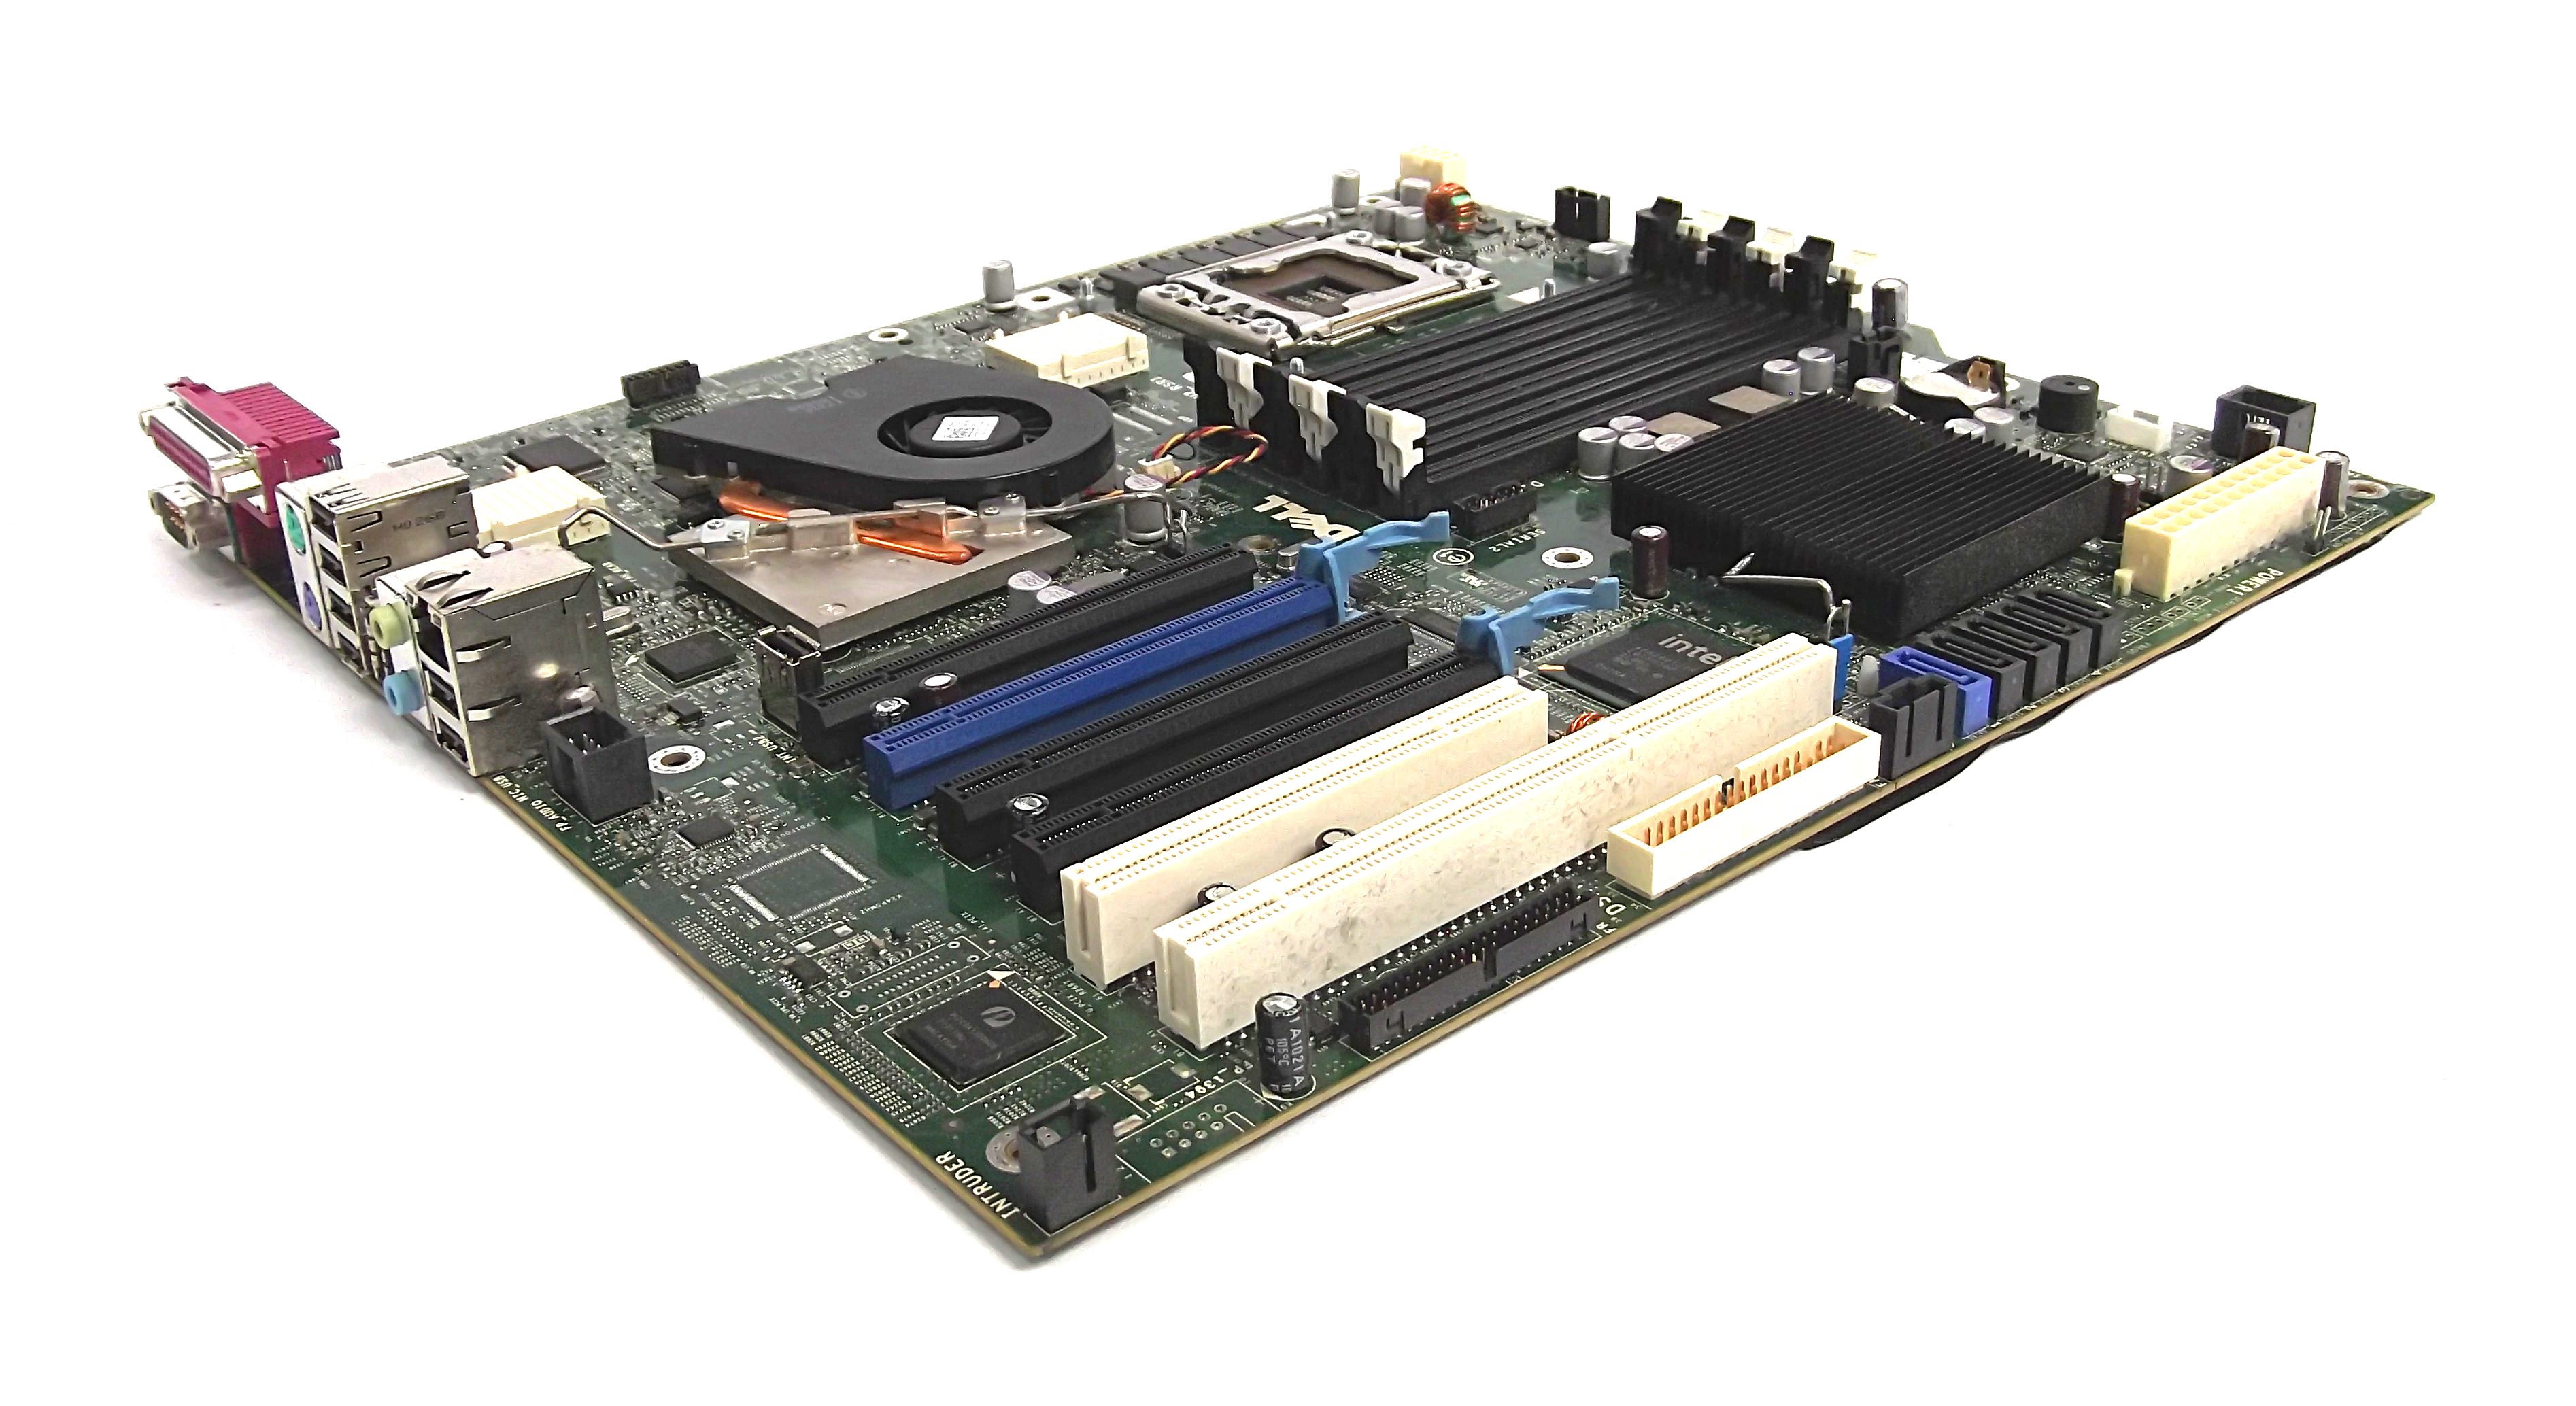 Dell CRH6C 0CRH6C Precision T5500 Socket 1366 System Board